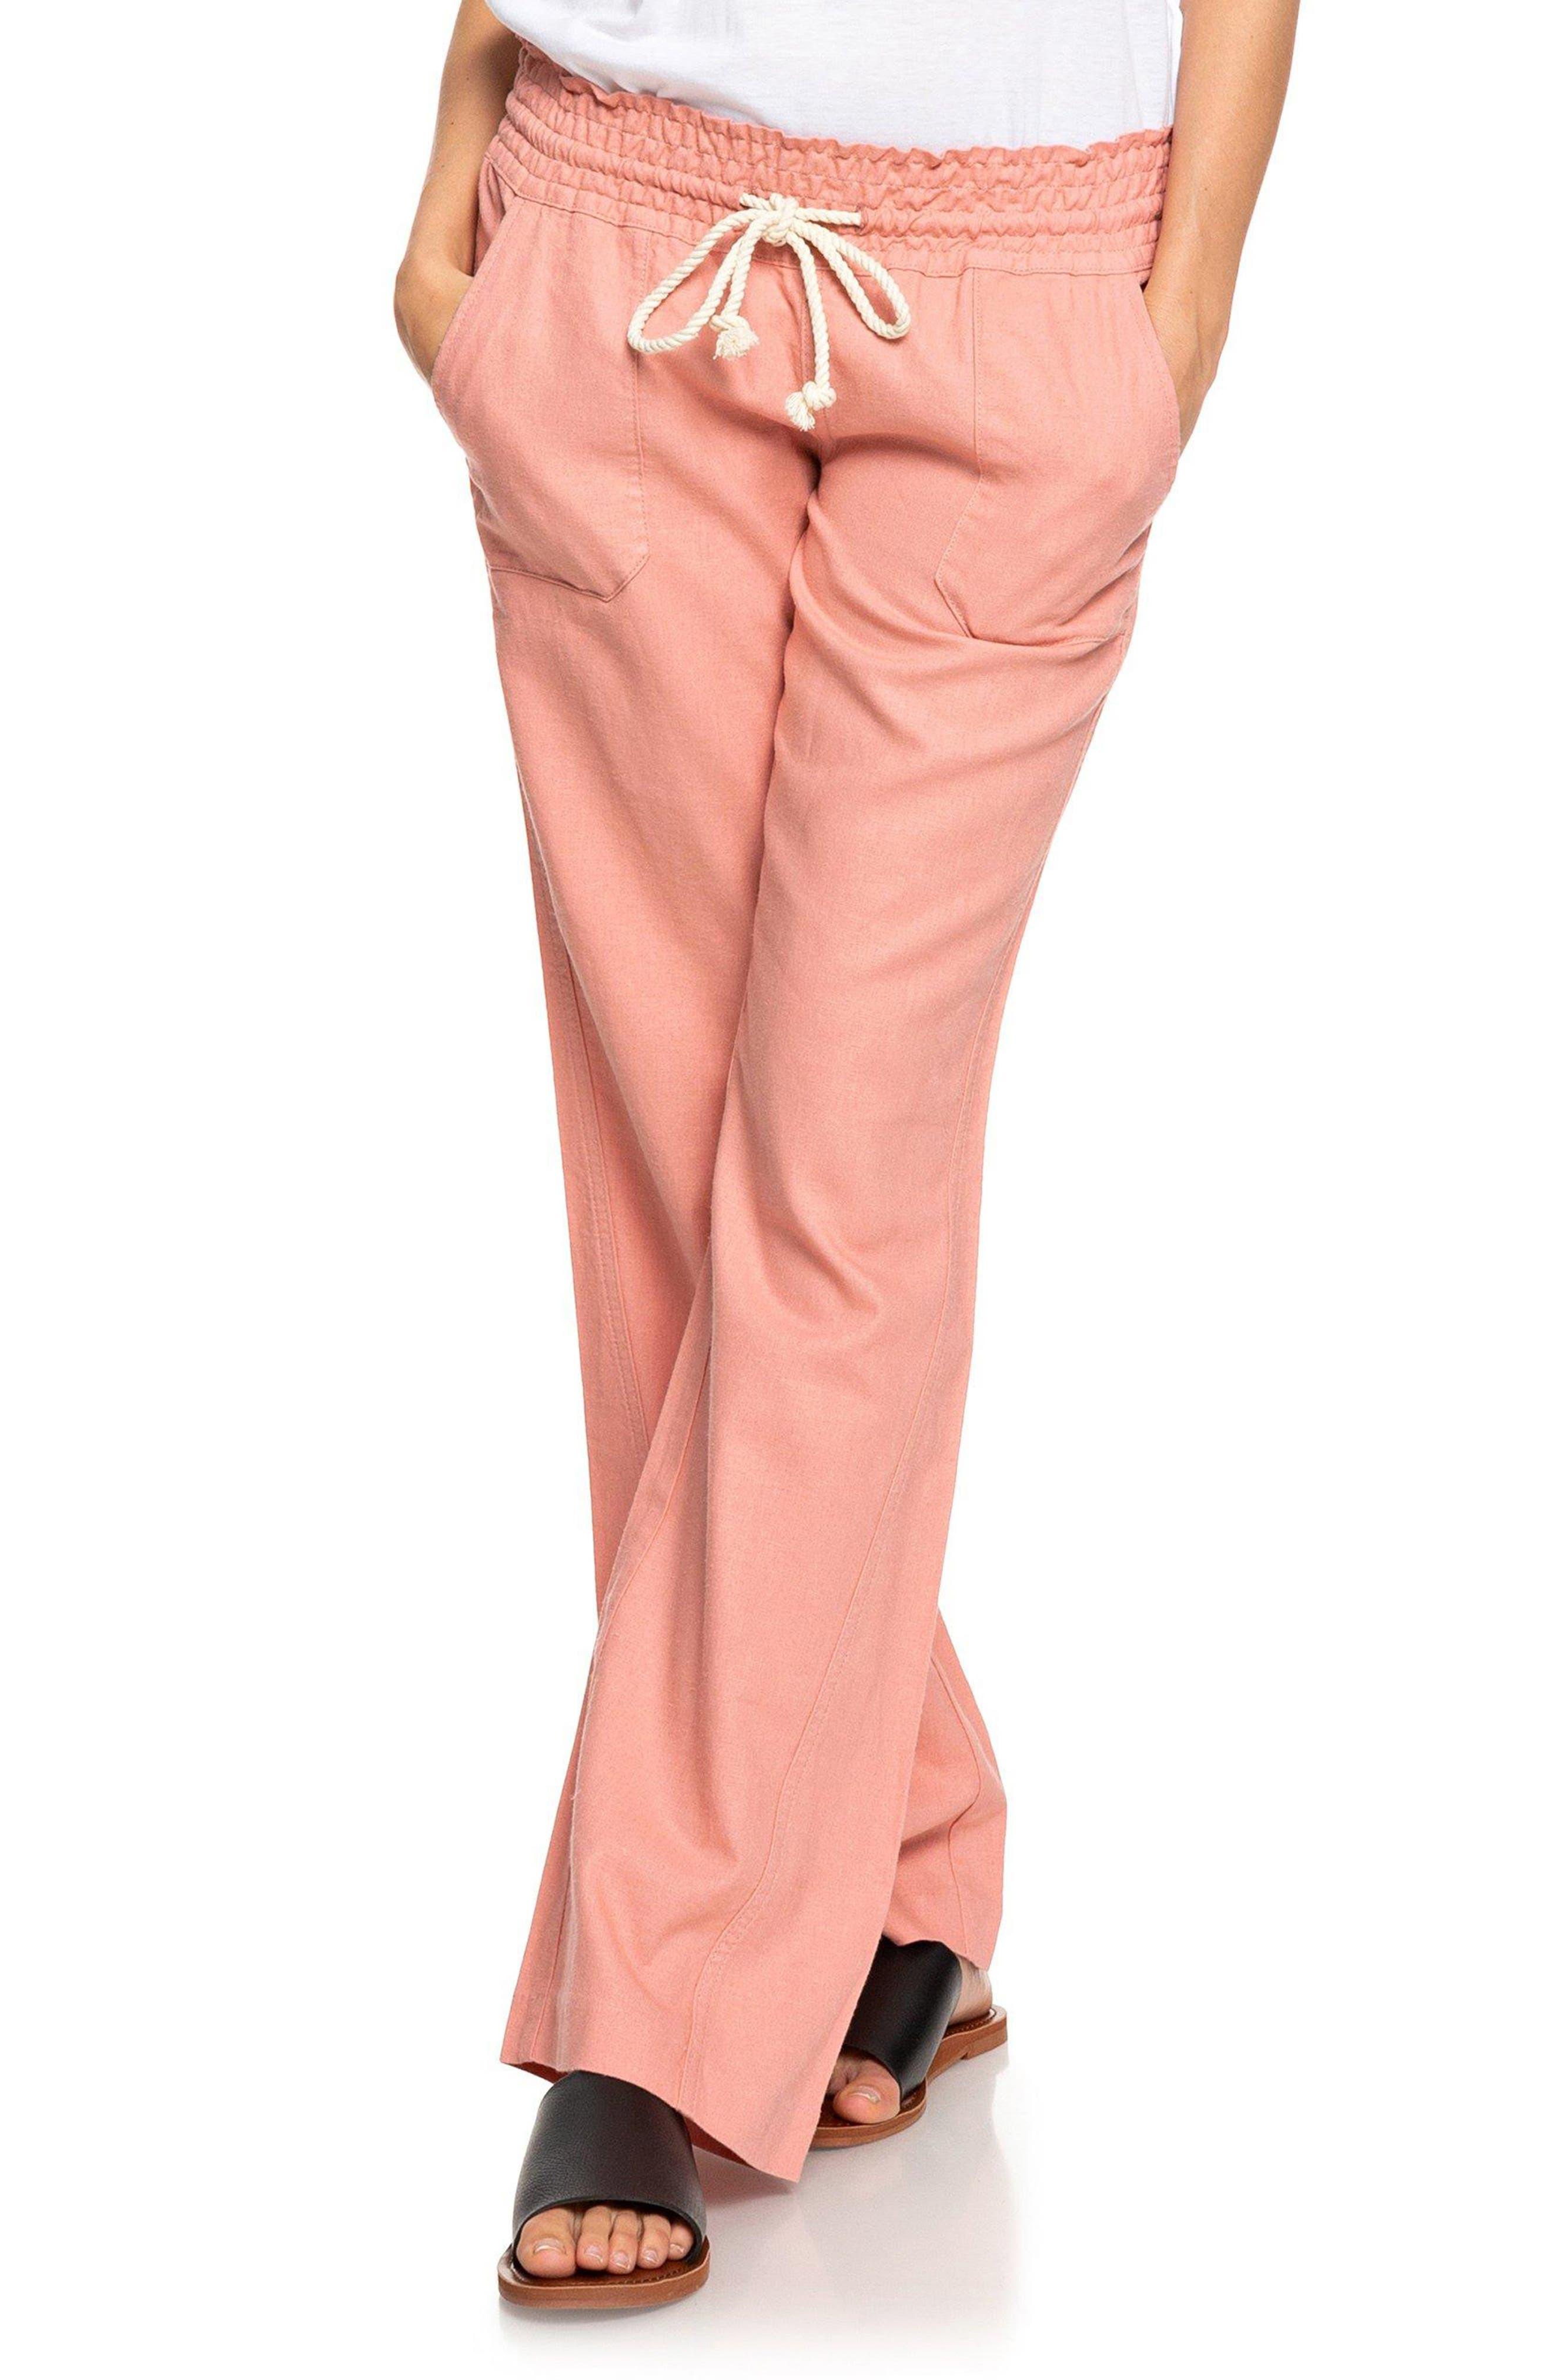 1914f40f76 Women's Pants Swimsuit Cover-Ups, Beachwear & Wraps | Nordstrom